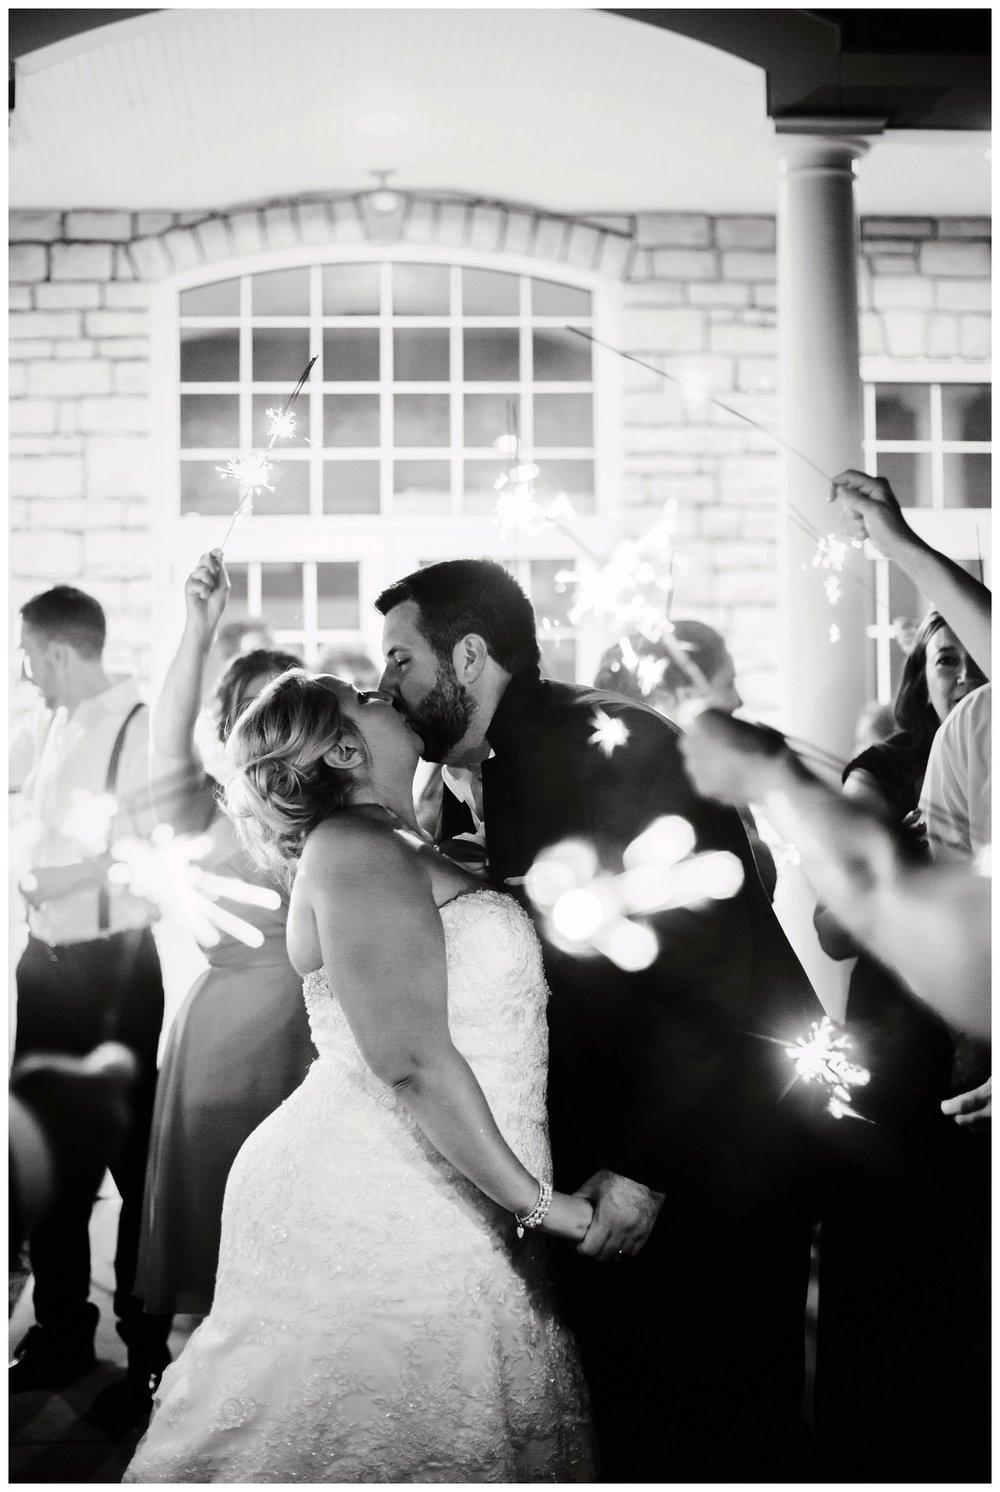 Mr. and Mrs. Kramp_0104.jpg